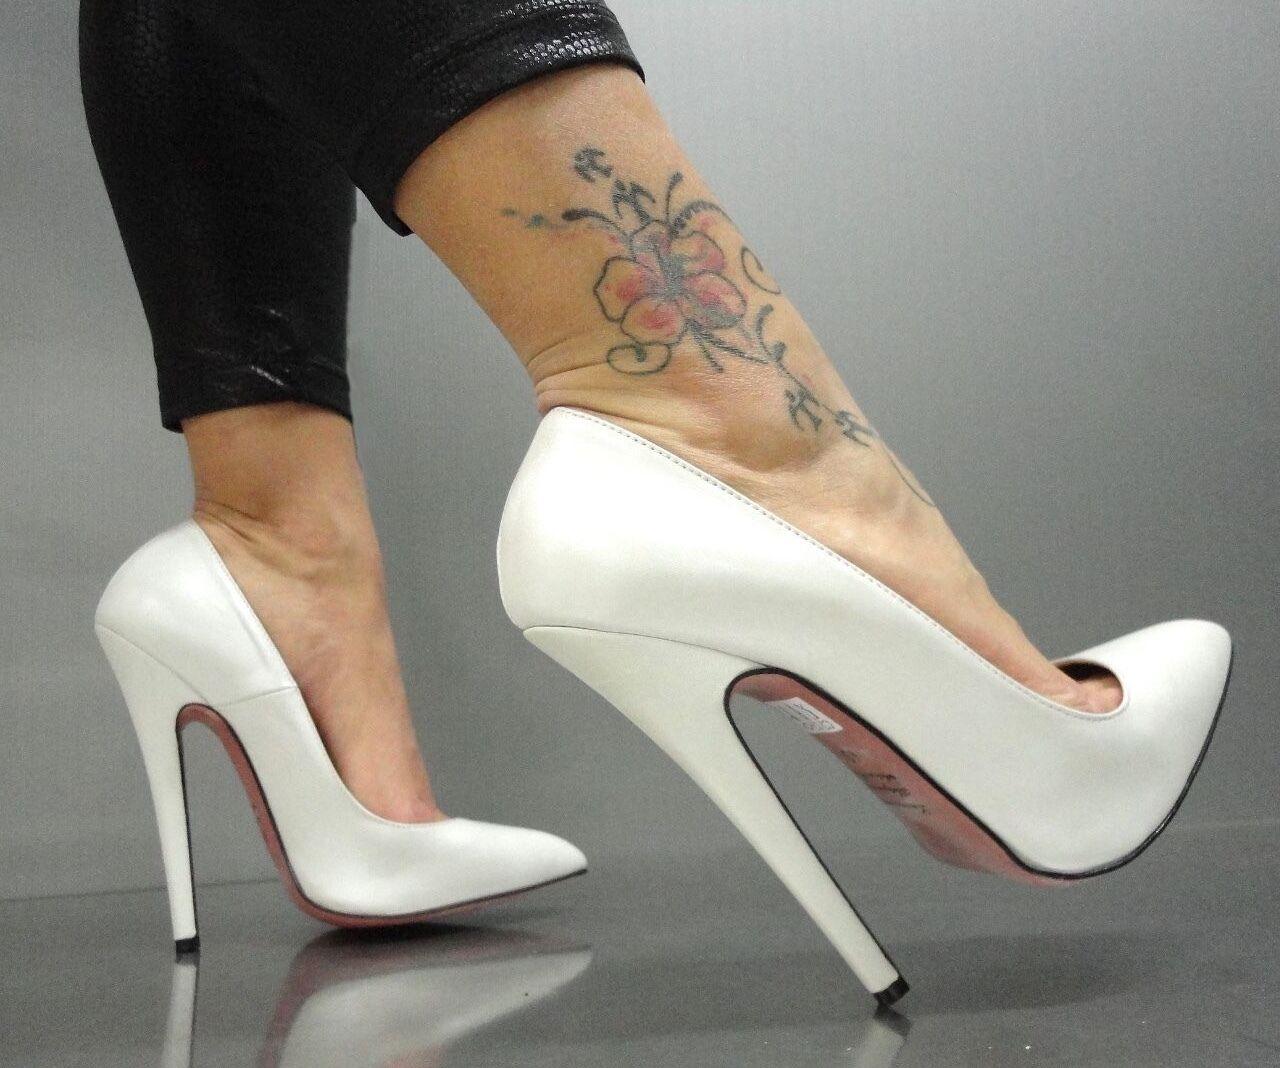 MORI MORI MORI MADE IN ITALY NEW HIGH SKY HEELS PUMPS SCHUHE Schuhe LEATHER Weiß BIANCO 38 51f71a